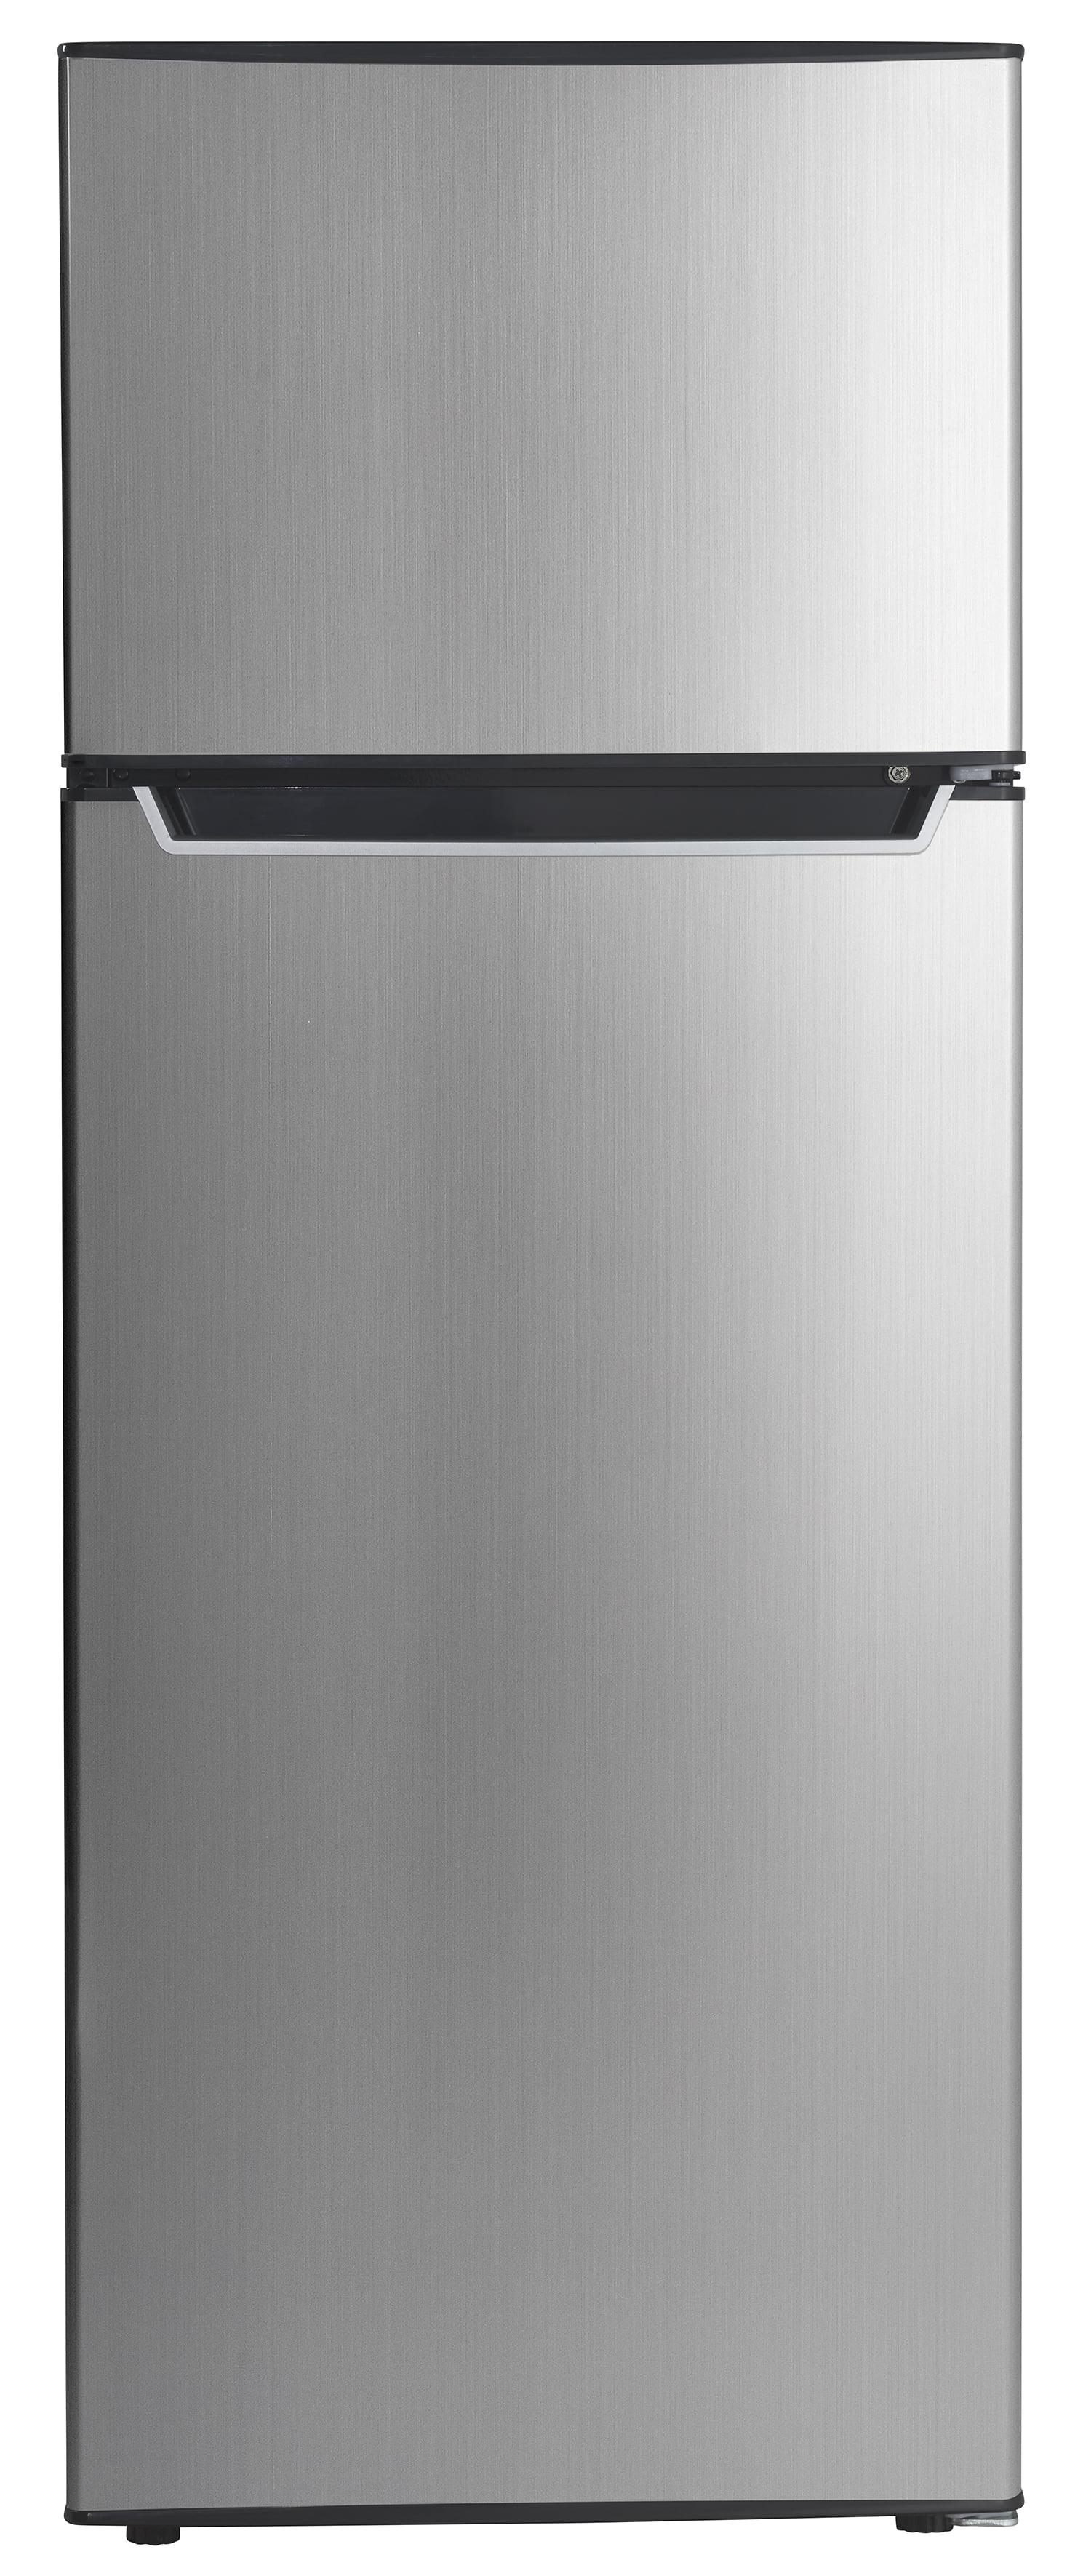 Danby 7.3 Cu. Ft. Apartment Size Refrigerator DPF073C2BSLDB ...